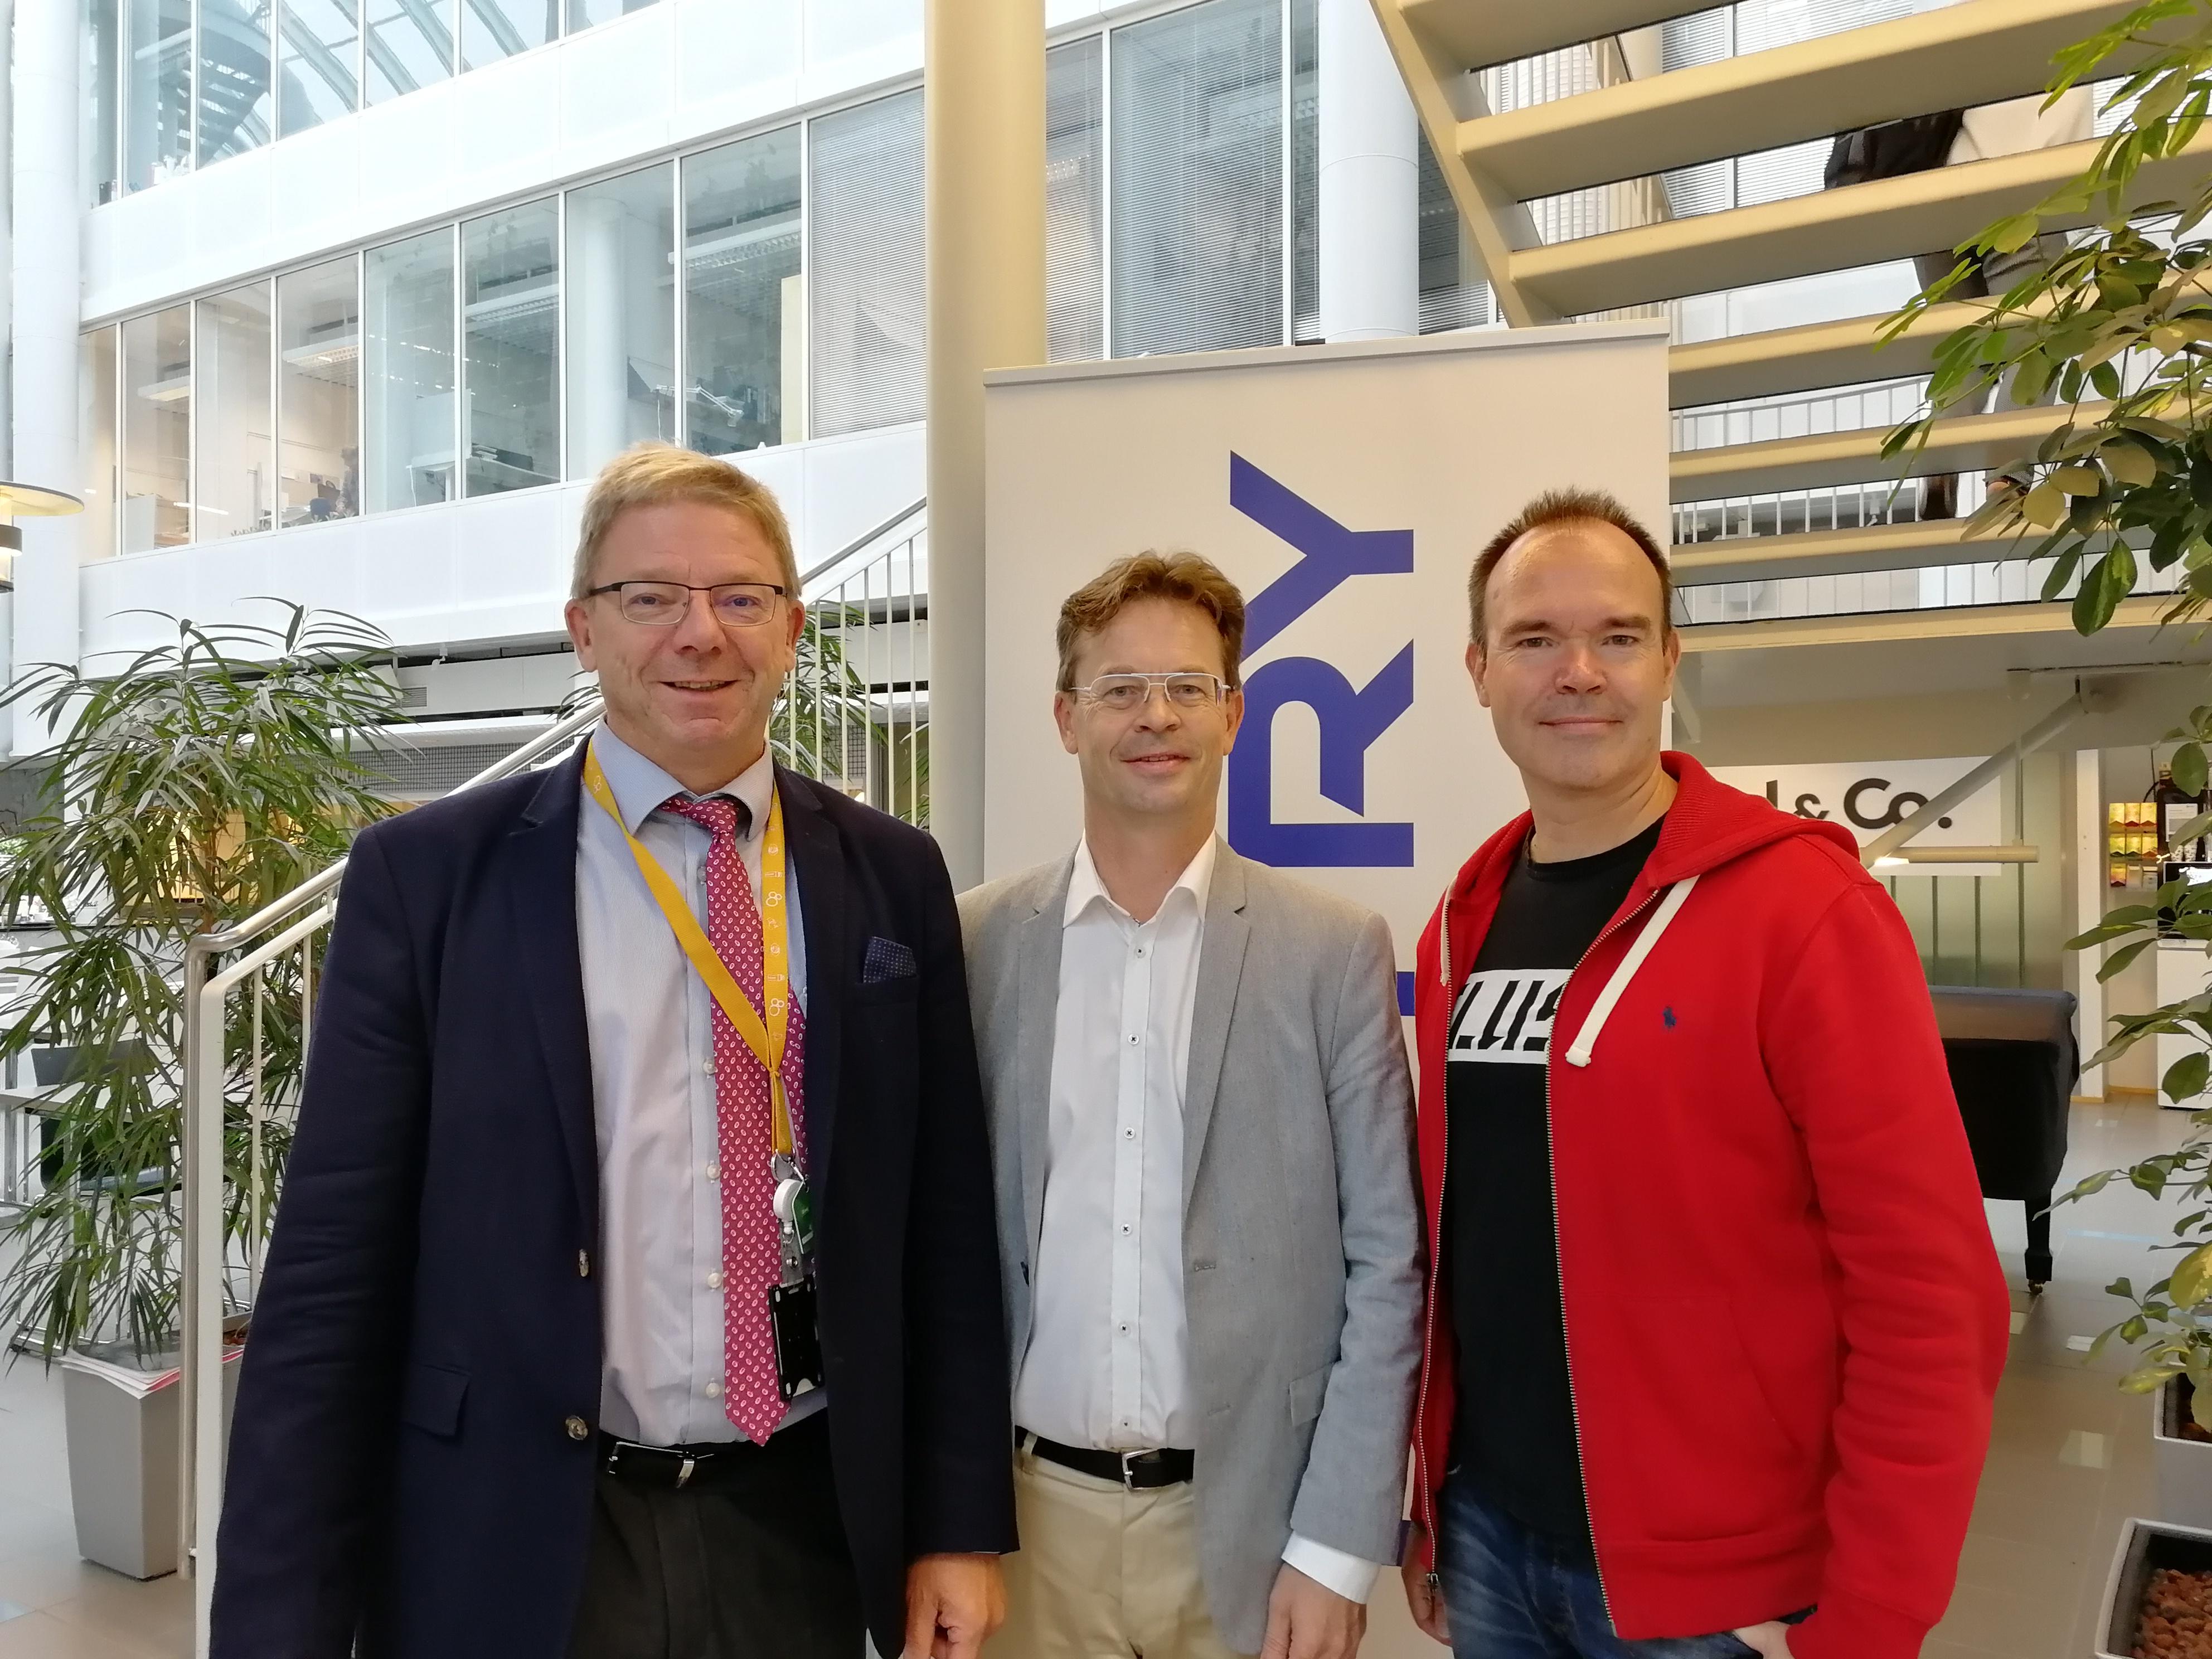 In the picture: Markku Oksanen, Timo Saanio and Peter Vesterbacka